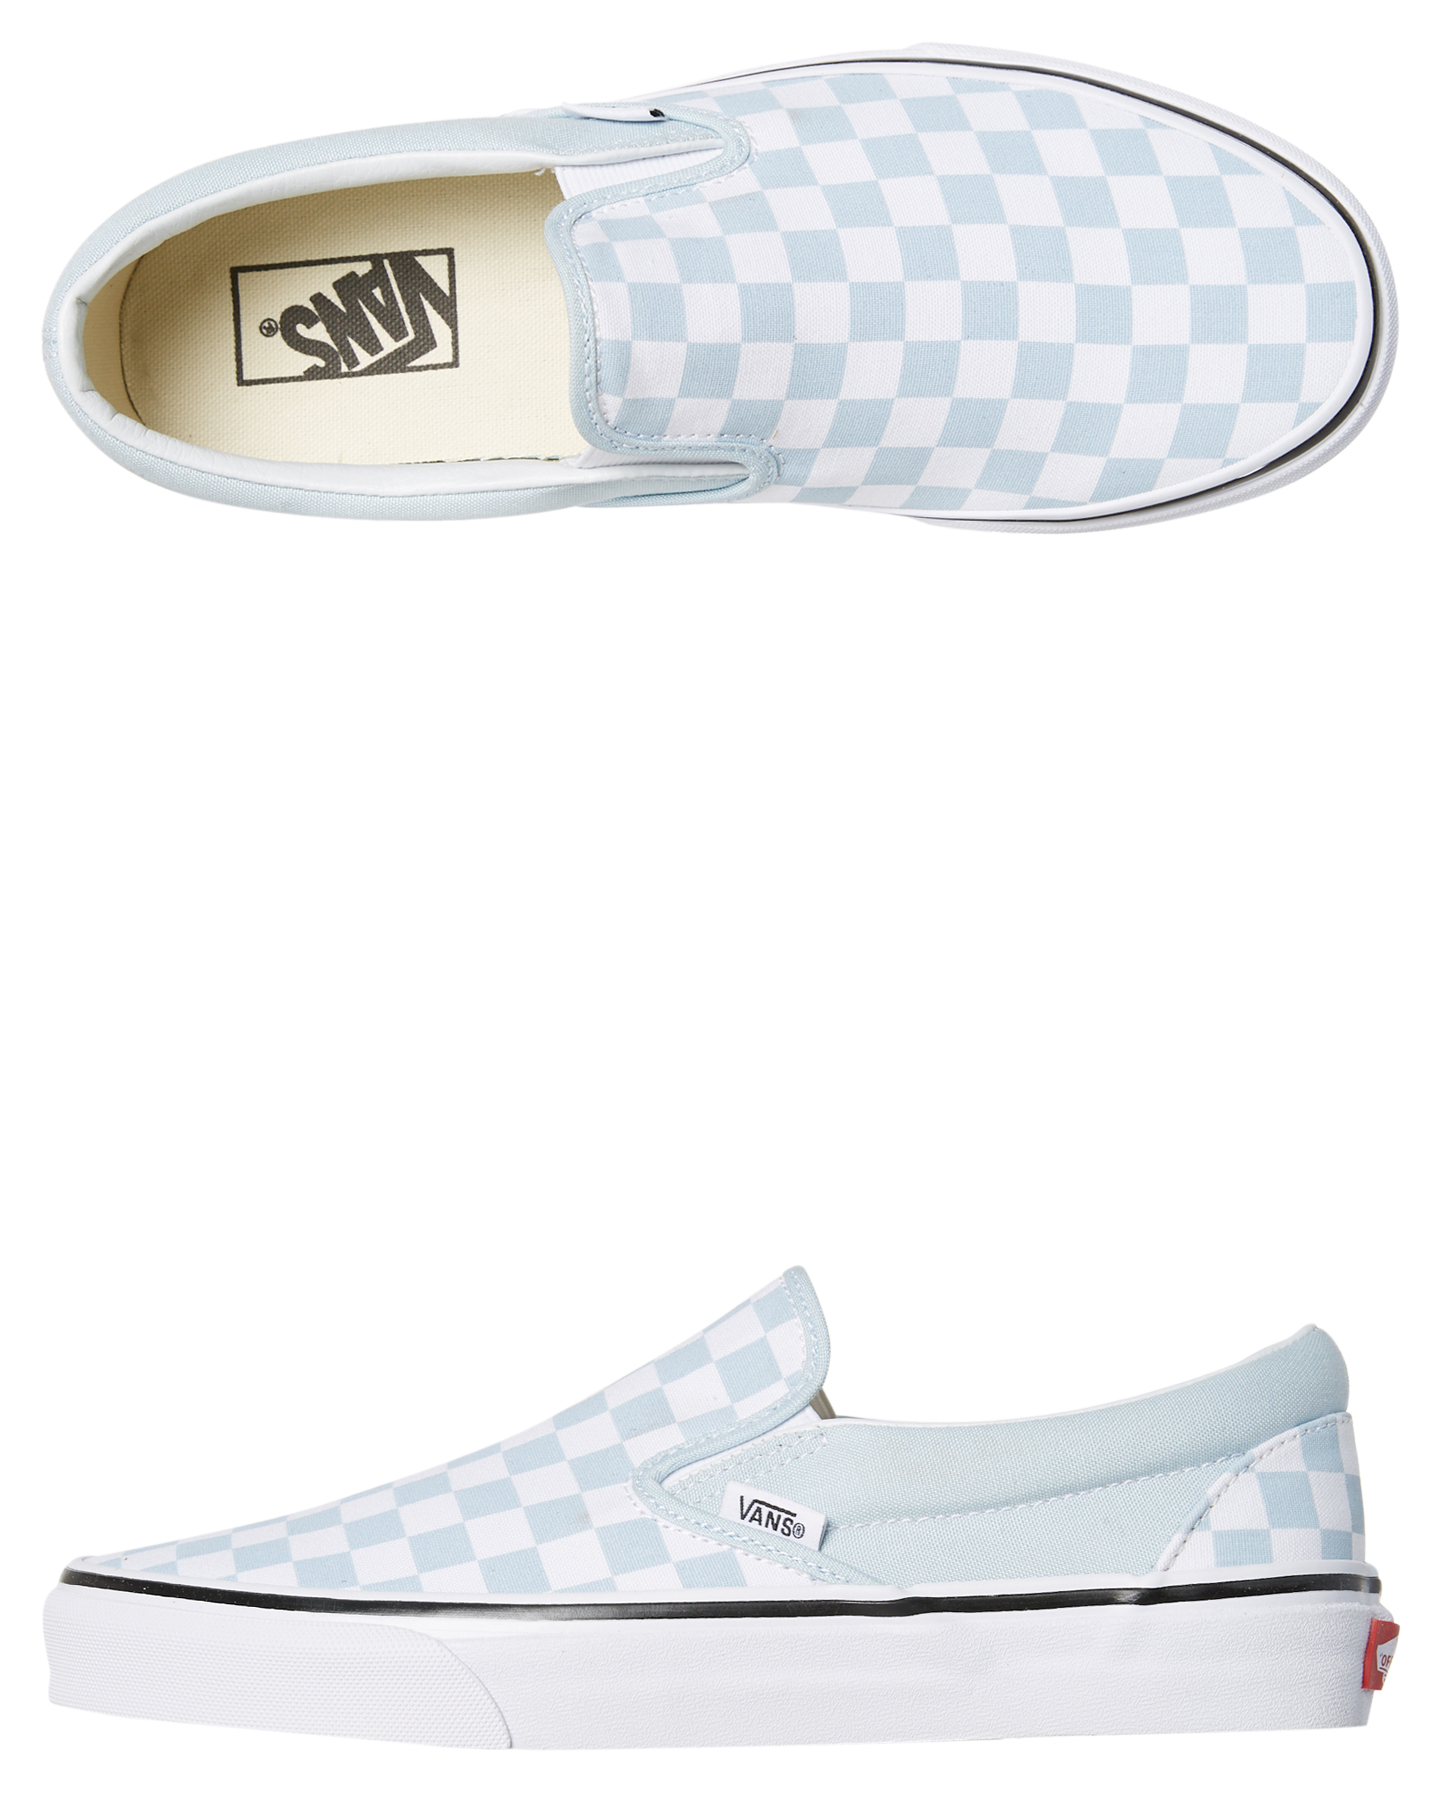 Vans Womens Classic Slip On Shoe Baby Blue Womens Slippers